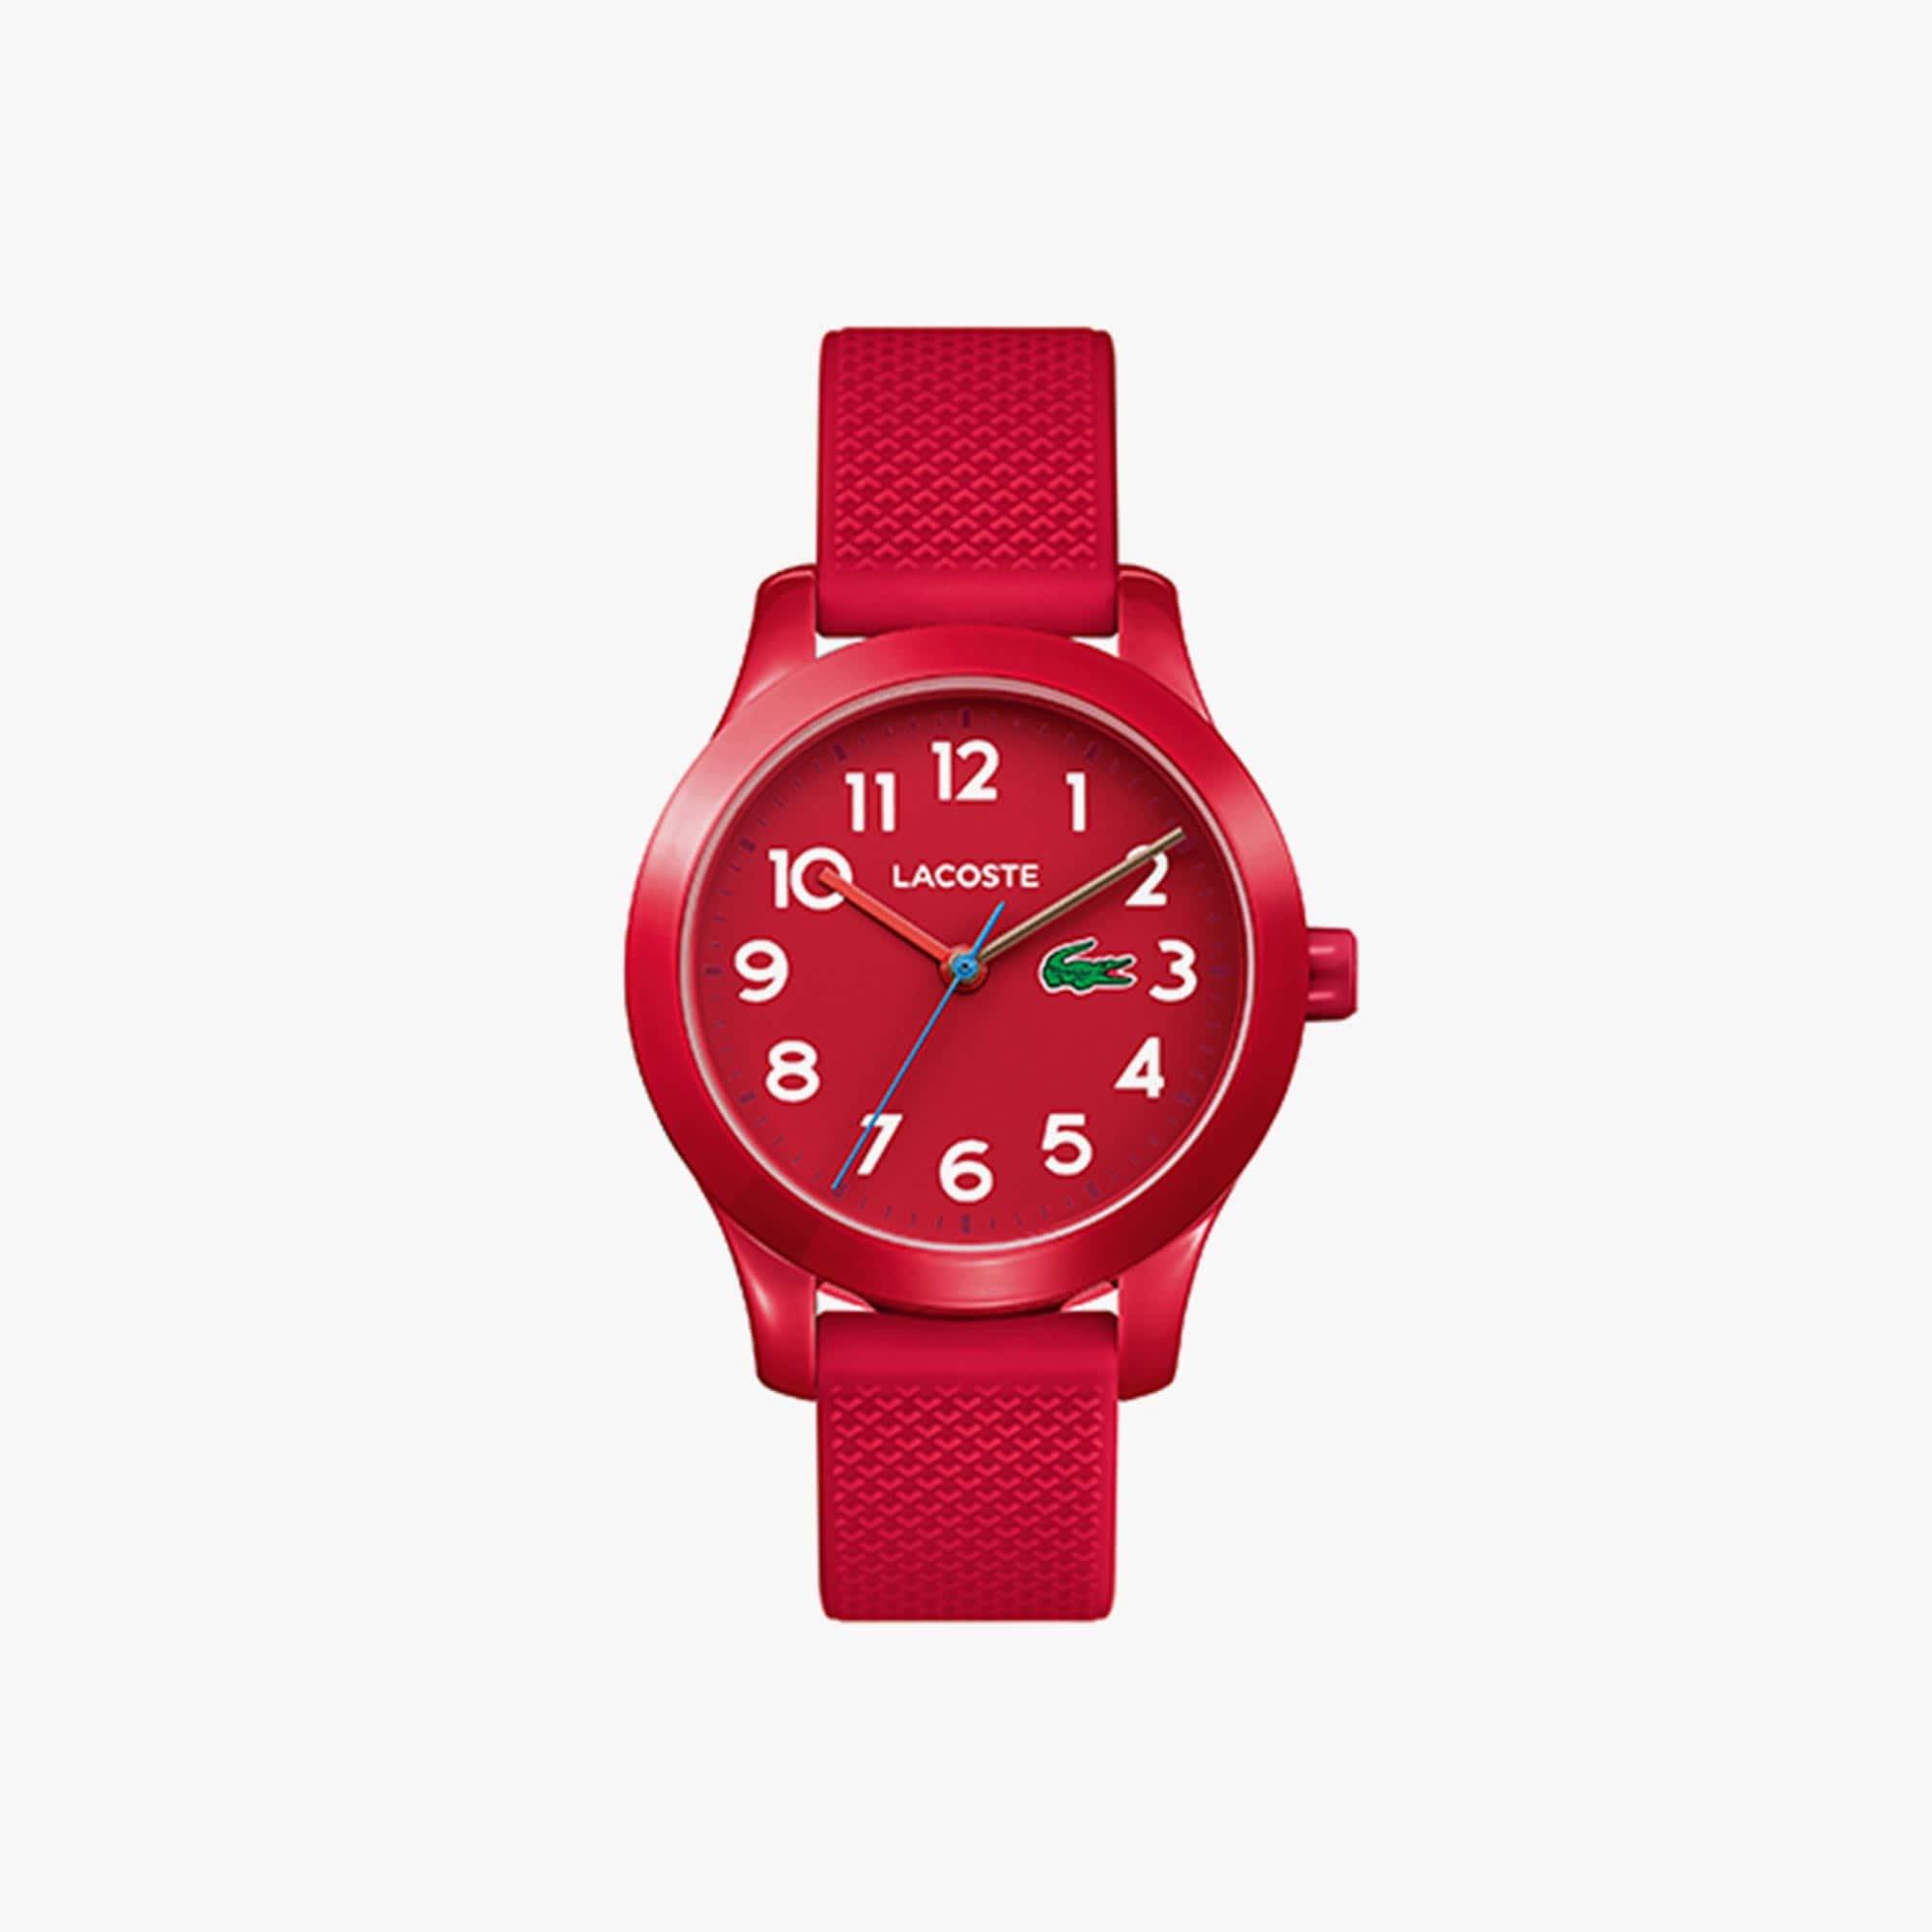 Reloj de Niño Lacoste 12.12 con Correa de Silicona Roja